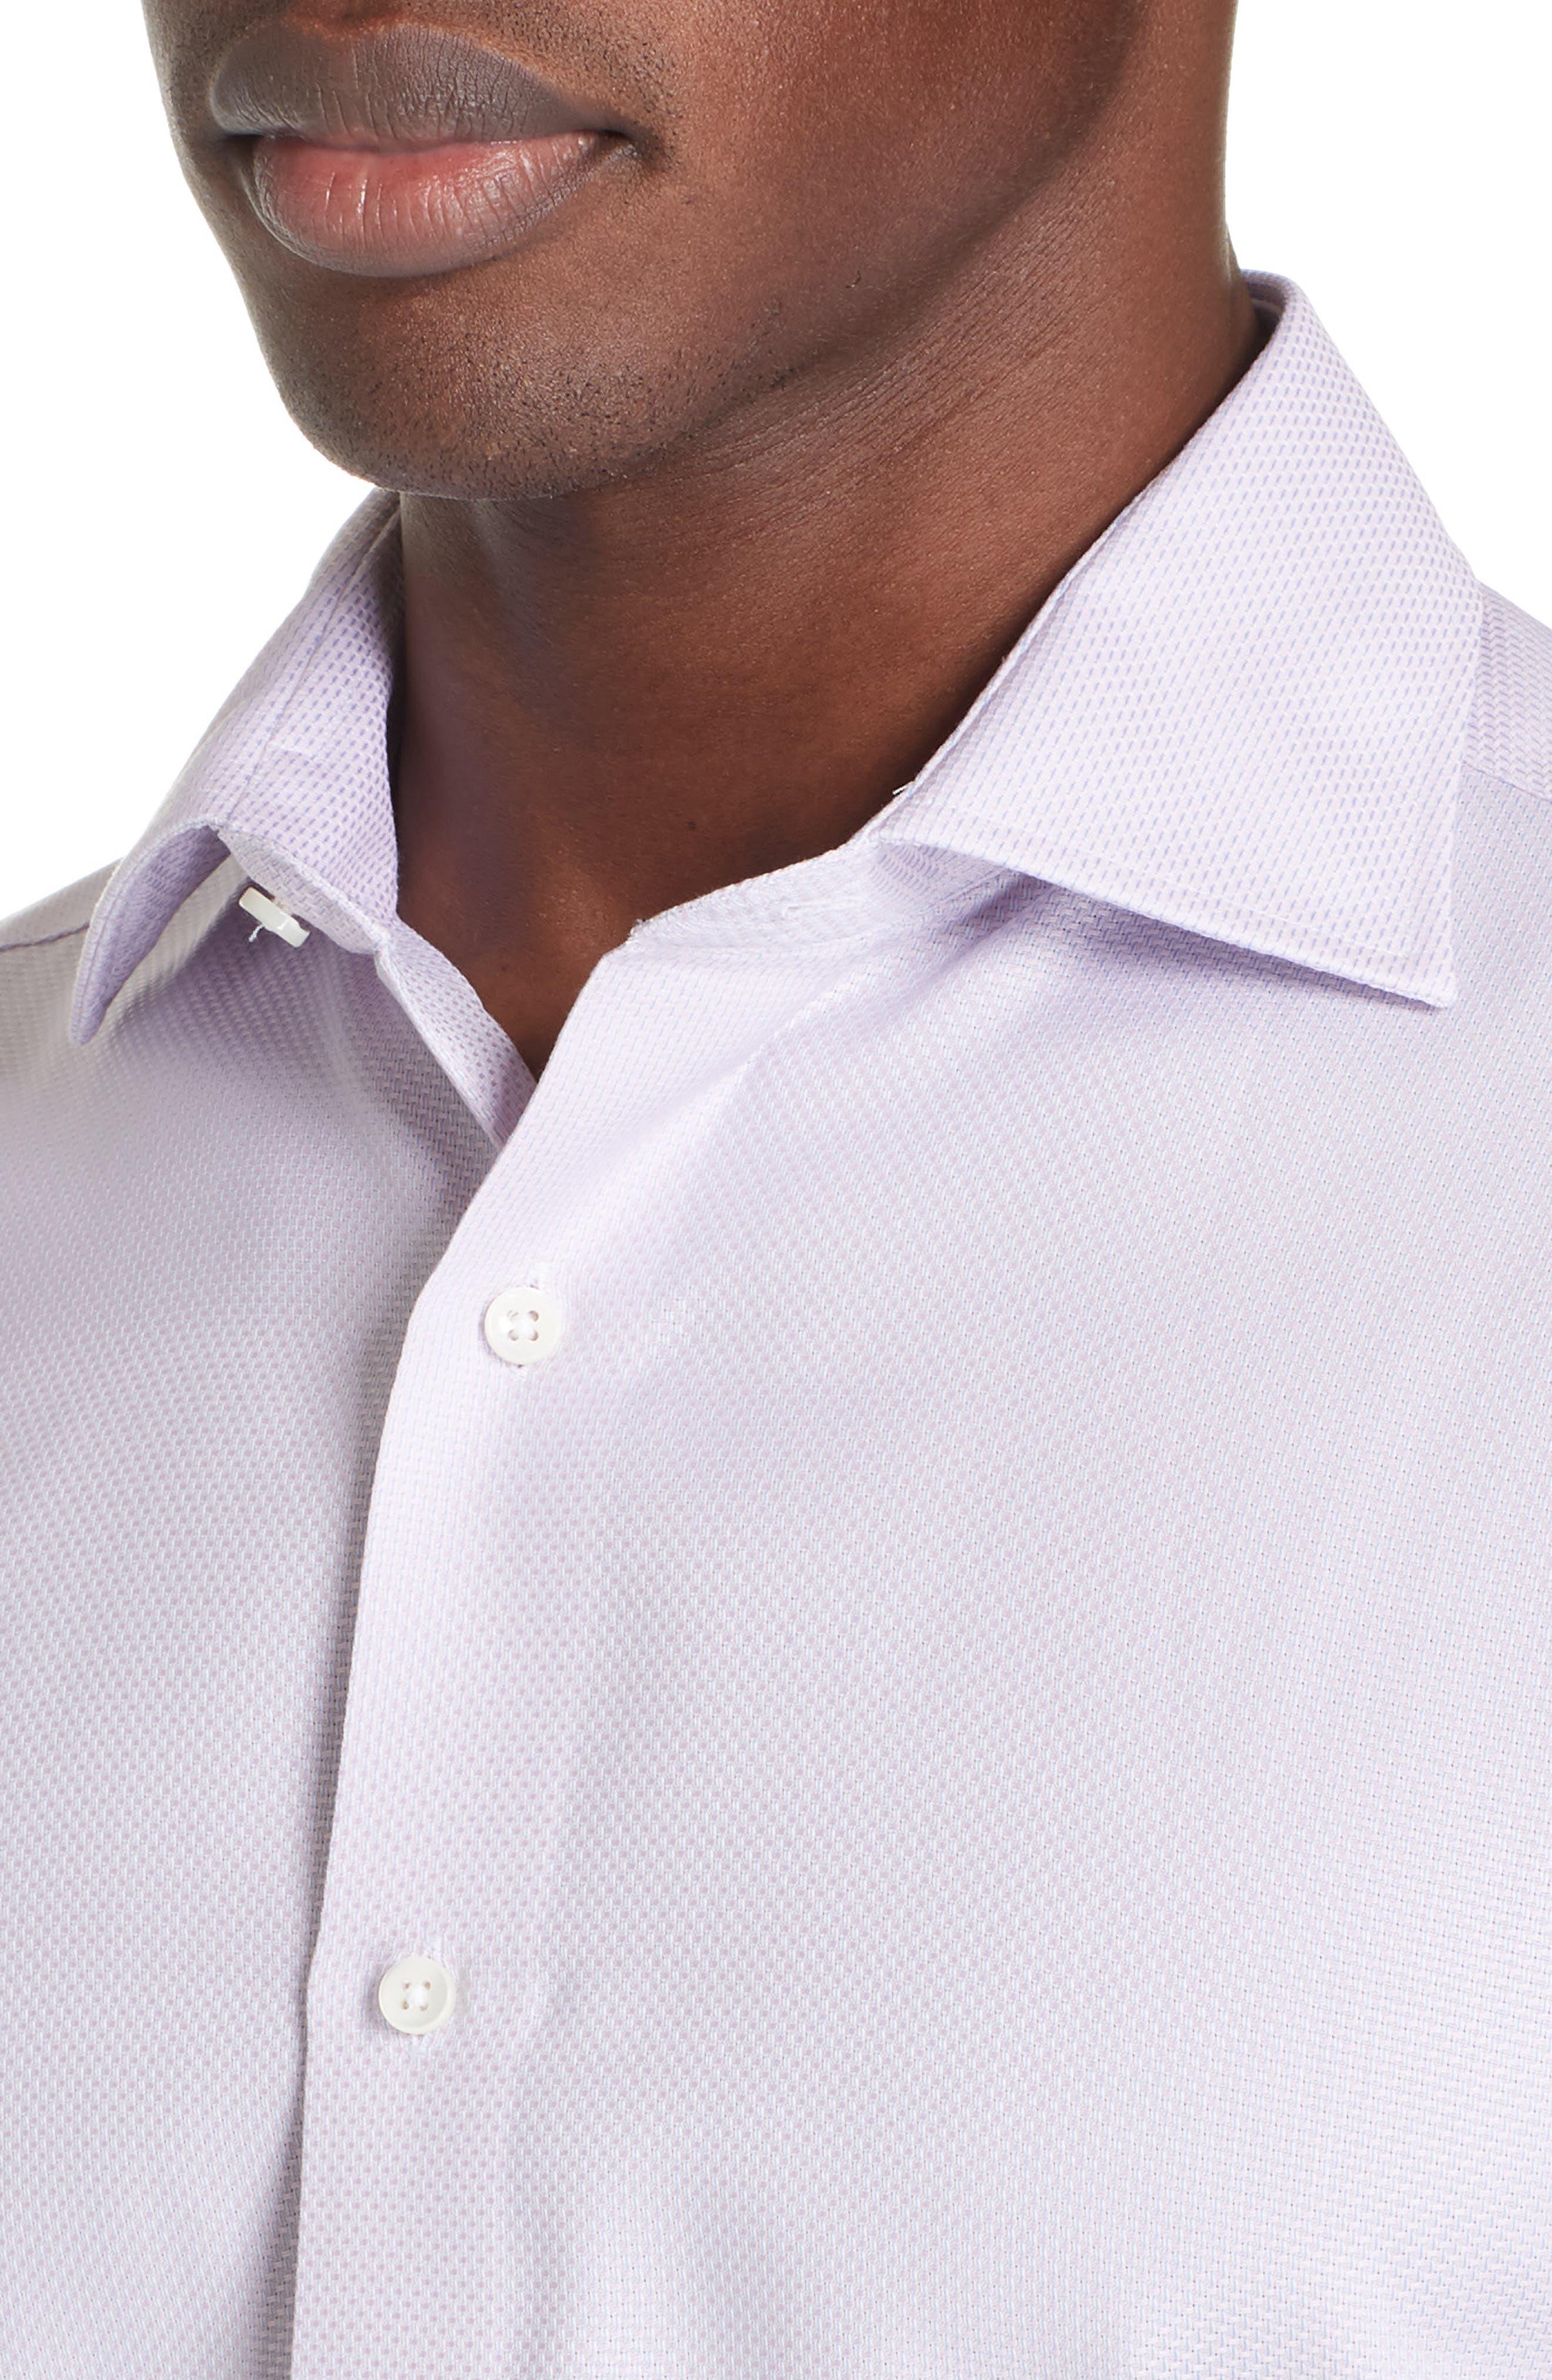 Trim Fit Solid Dress Shirt,                             Alternate thumbnail 2, color,                             LIGHT PINK